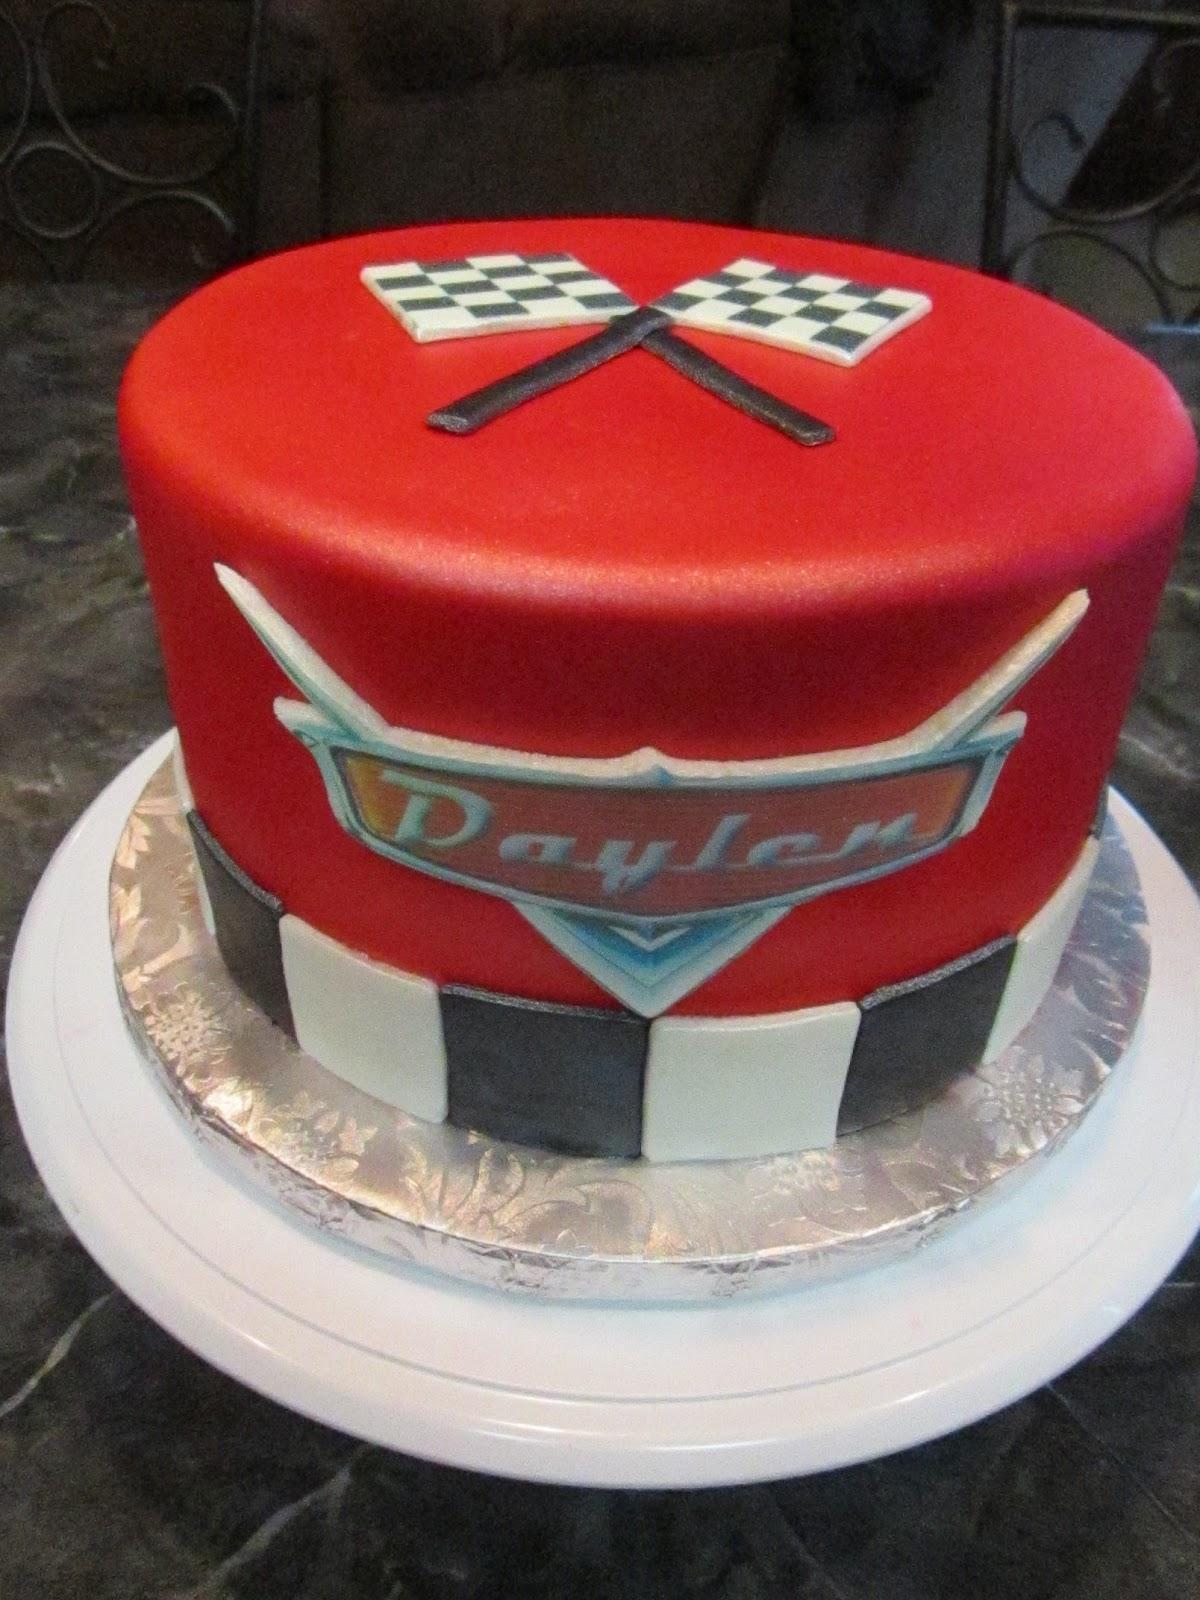 Disney Cars Cake Images : MyMoniCakes: Disney Pixar s Cars Cake